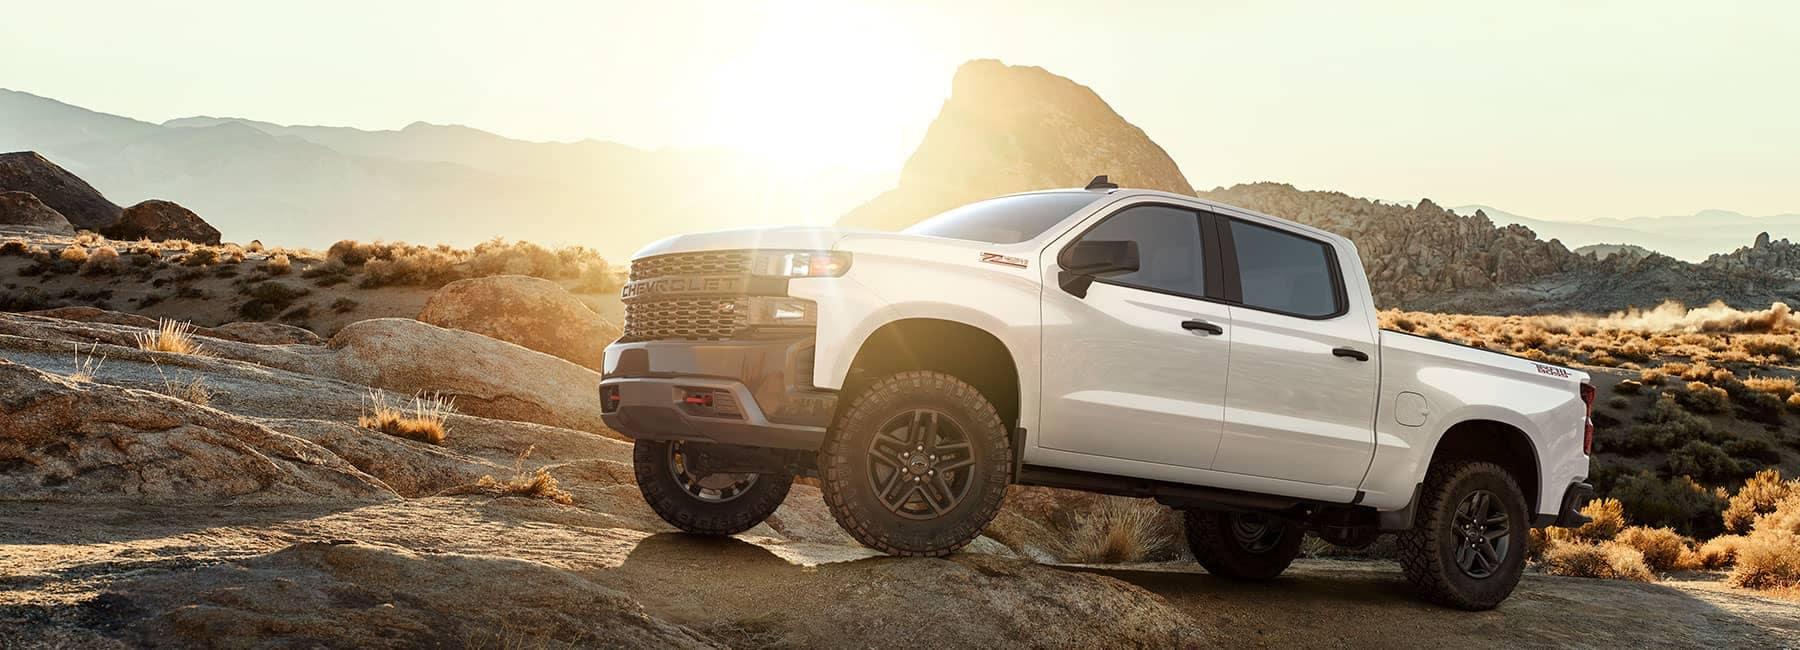 2019 Chevrolet Truck